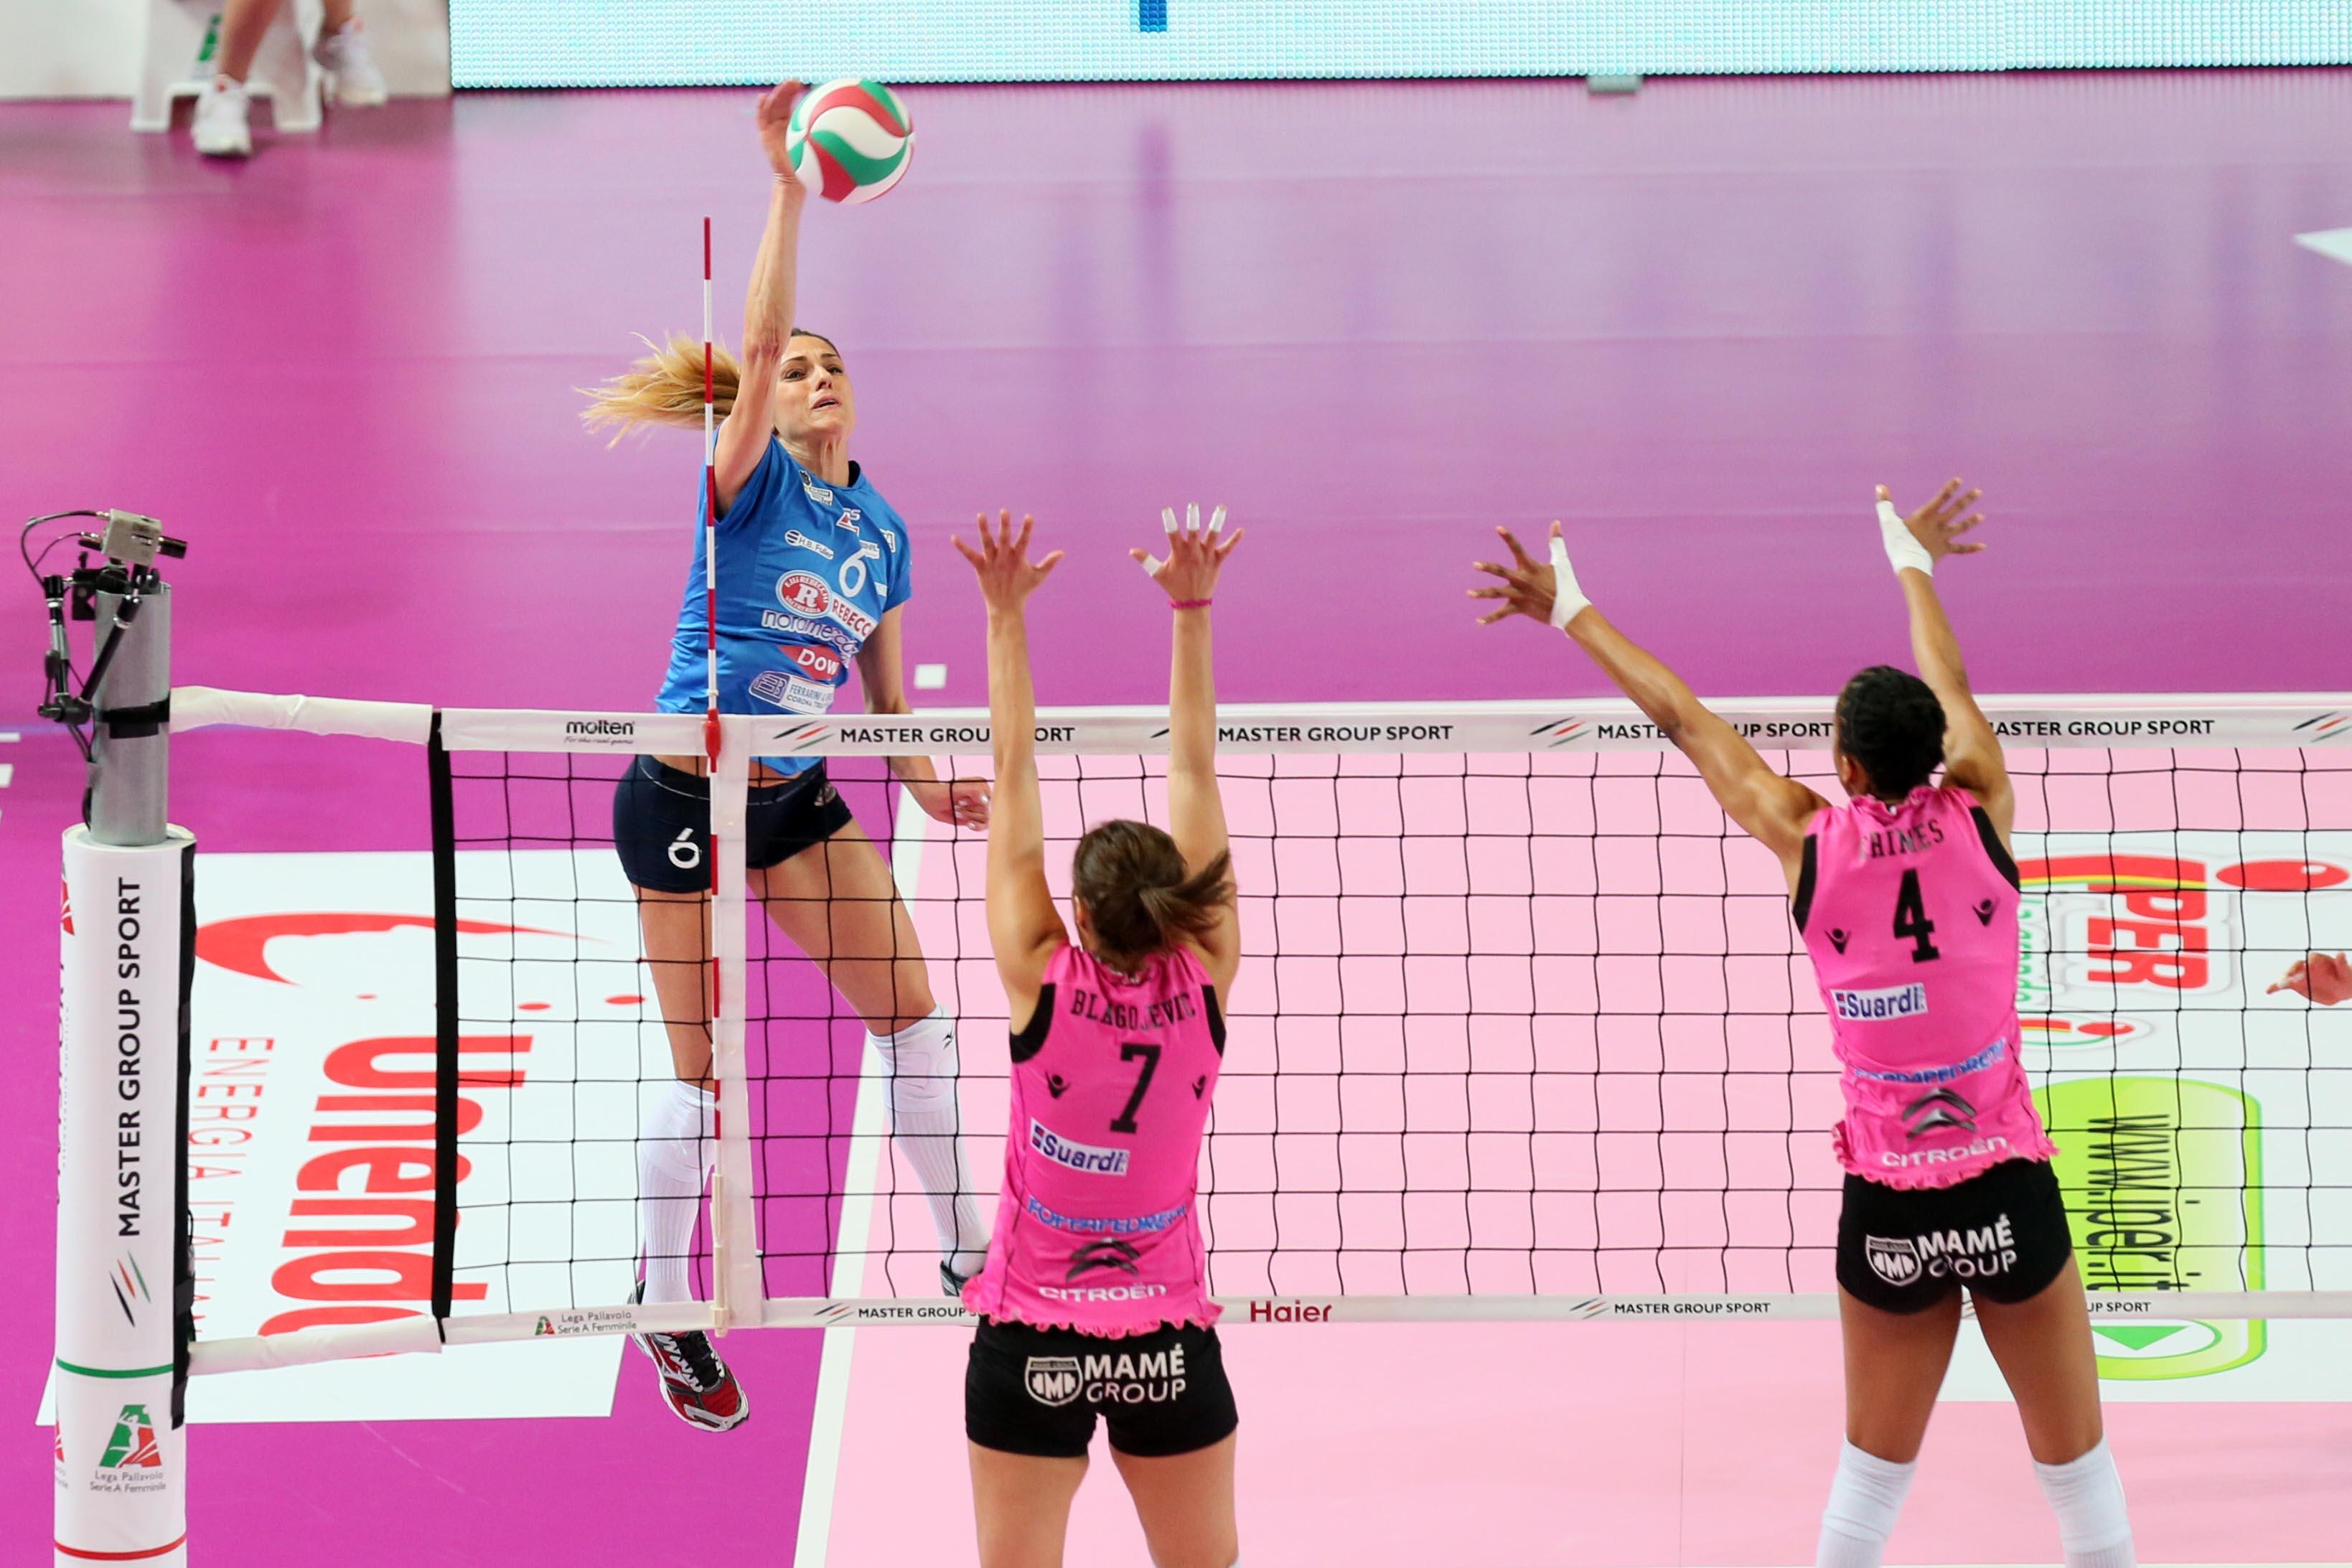 Volley_Femminile_serie_A1_Bergamo_Piacenza